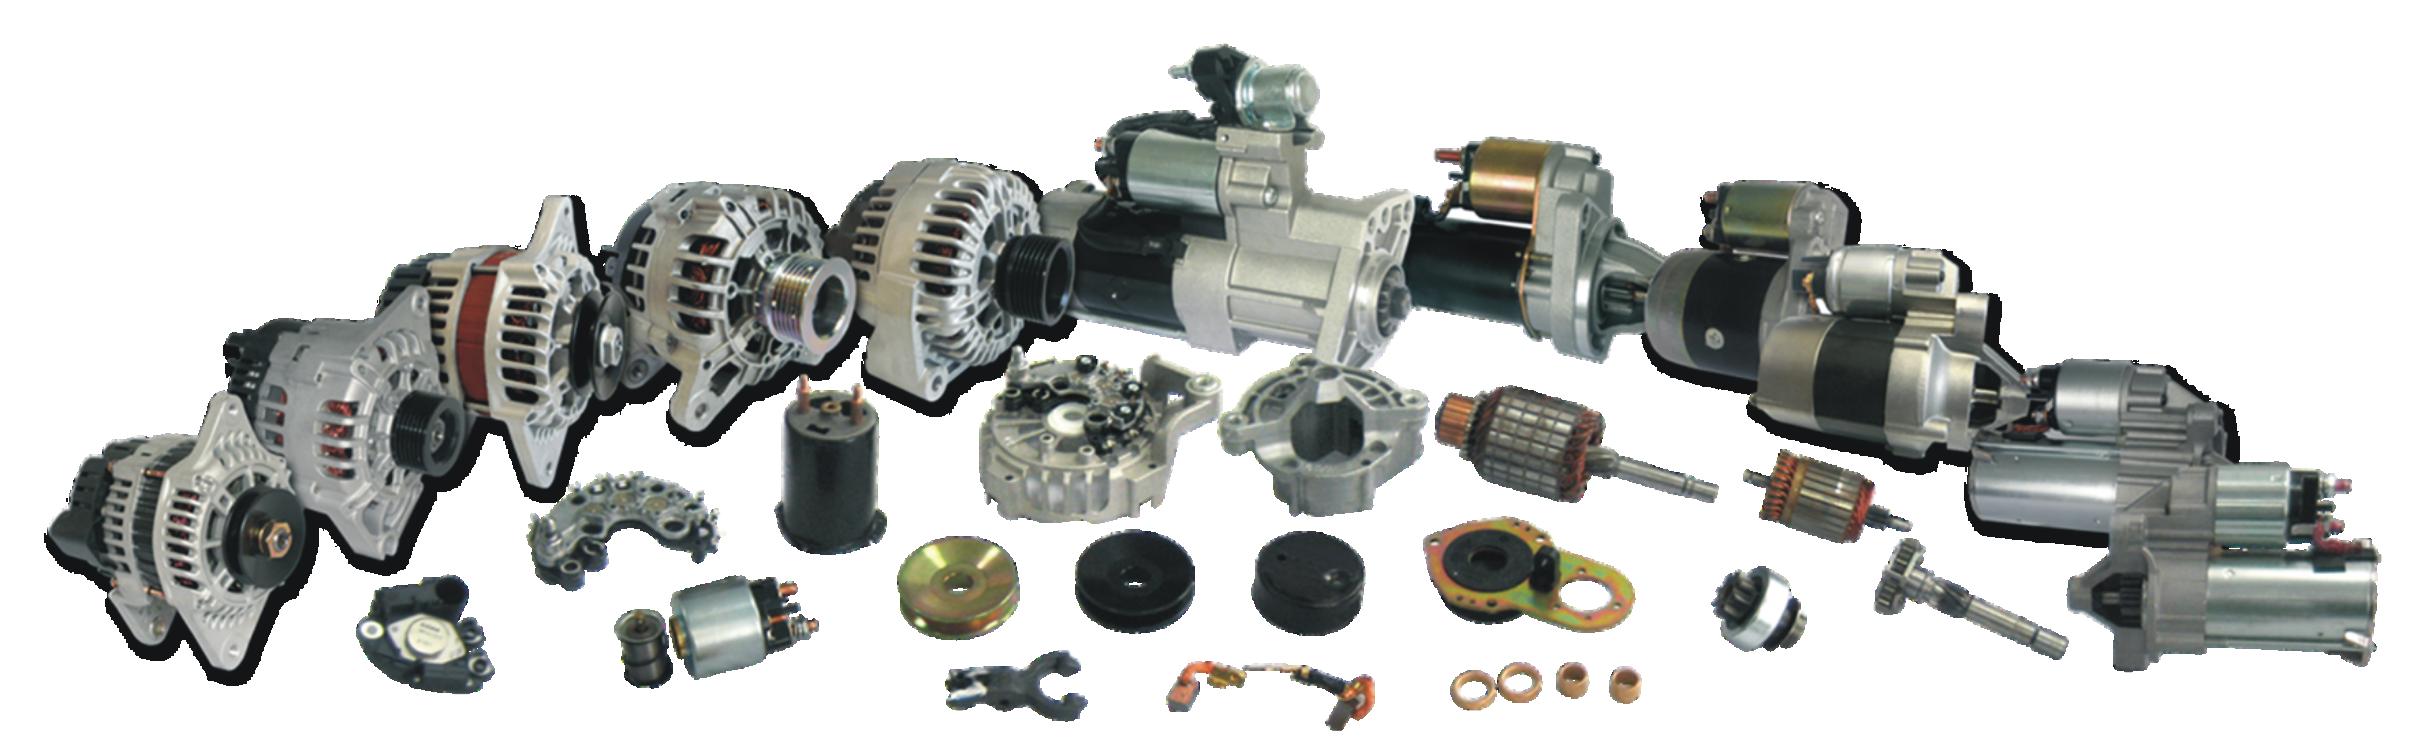 recondiitioned starter motors australia